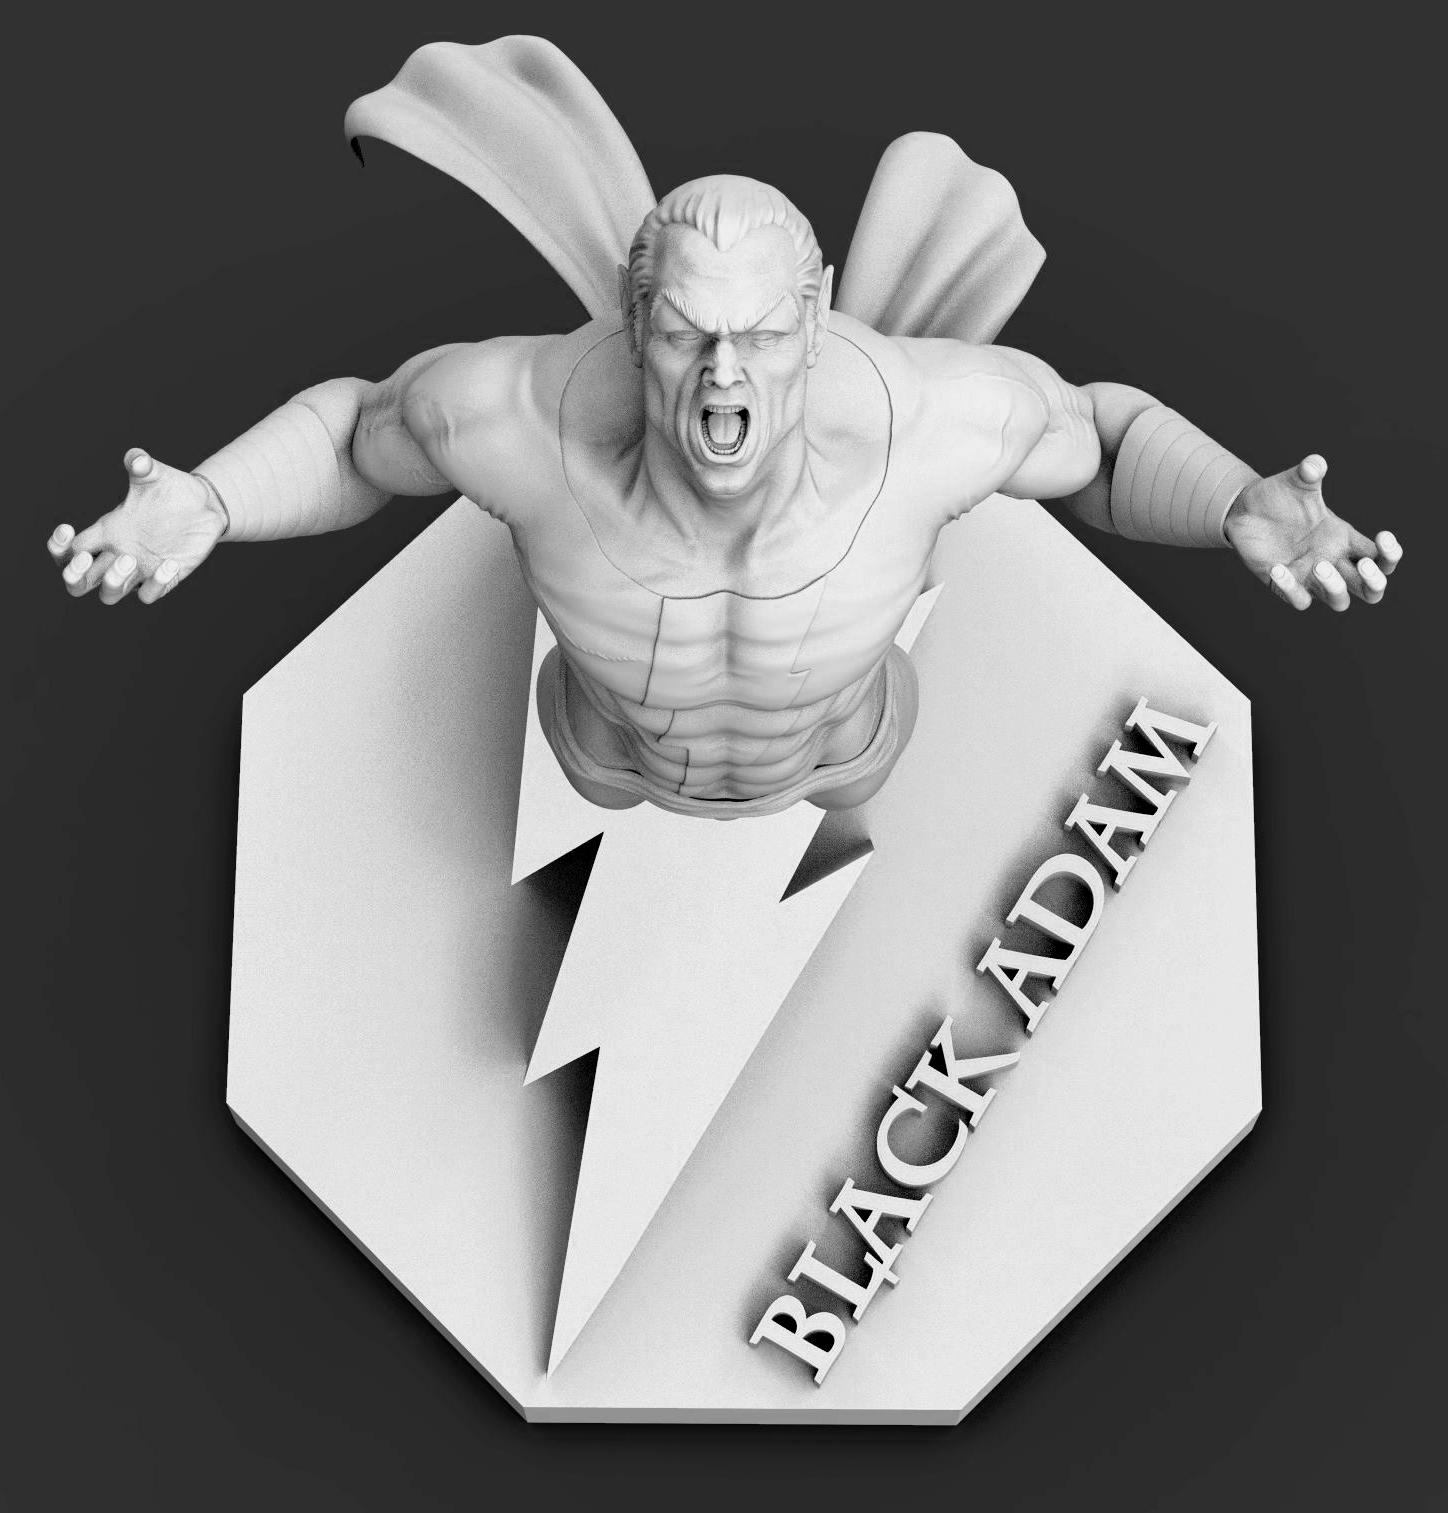 Black Bolt Zbrush